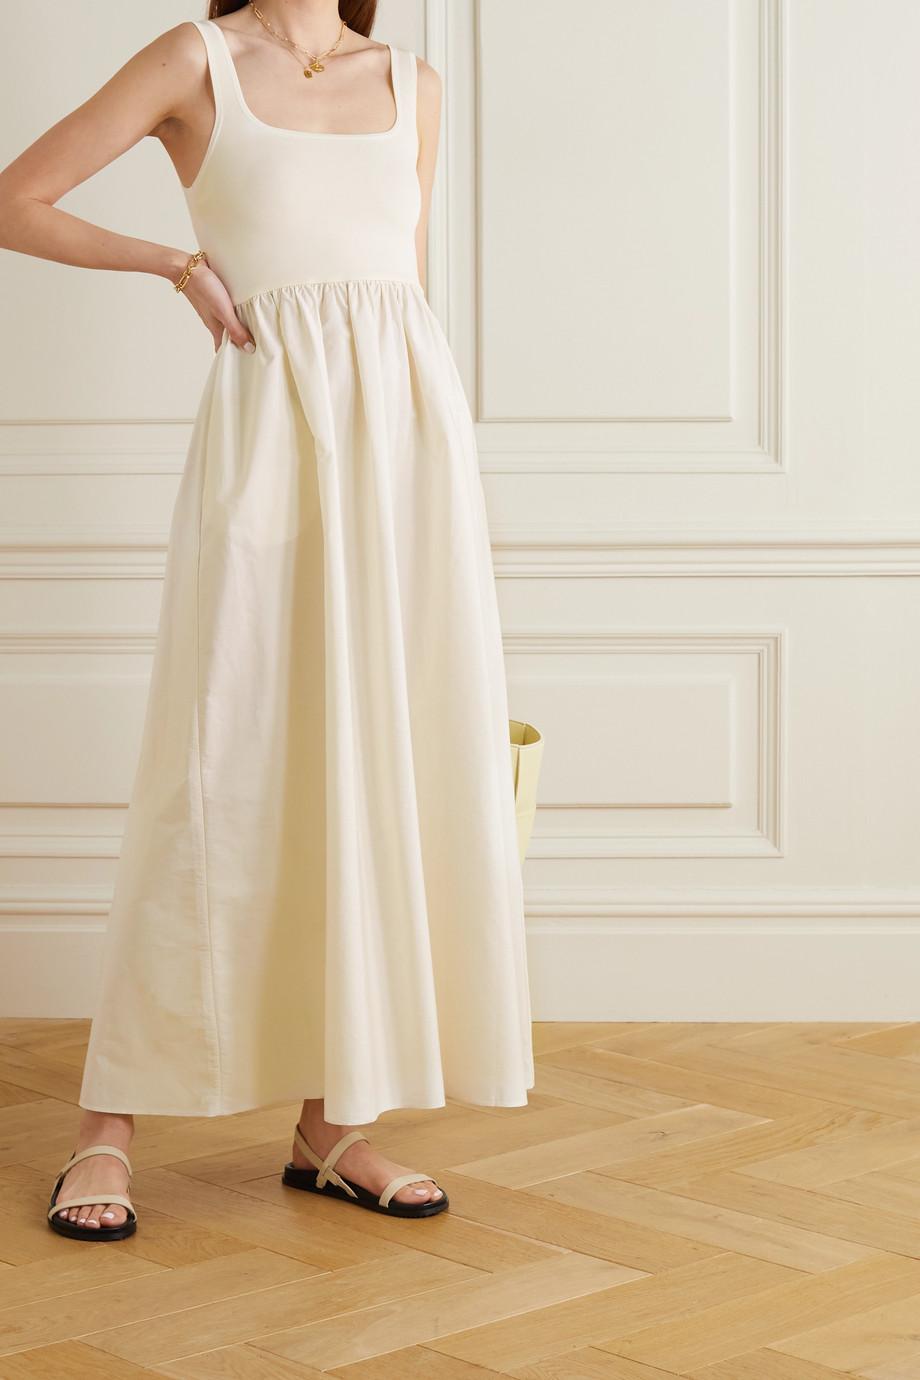 Matteau + NET SUSTAIN cotton-poplin and stretch-knit maxi dress